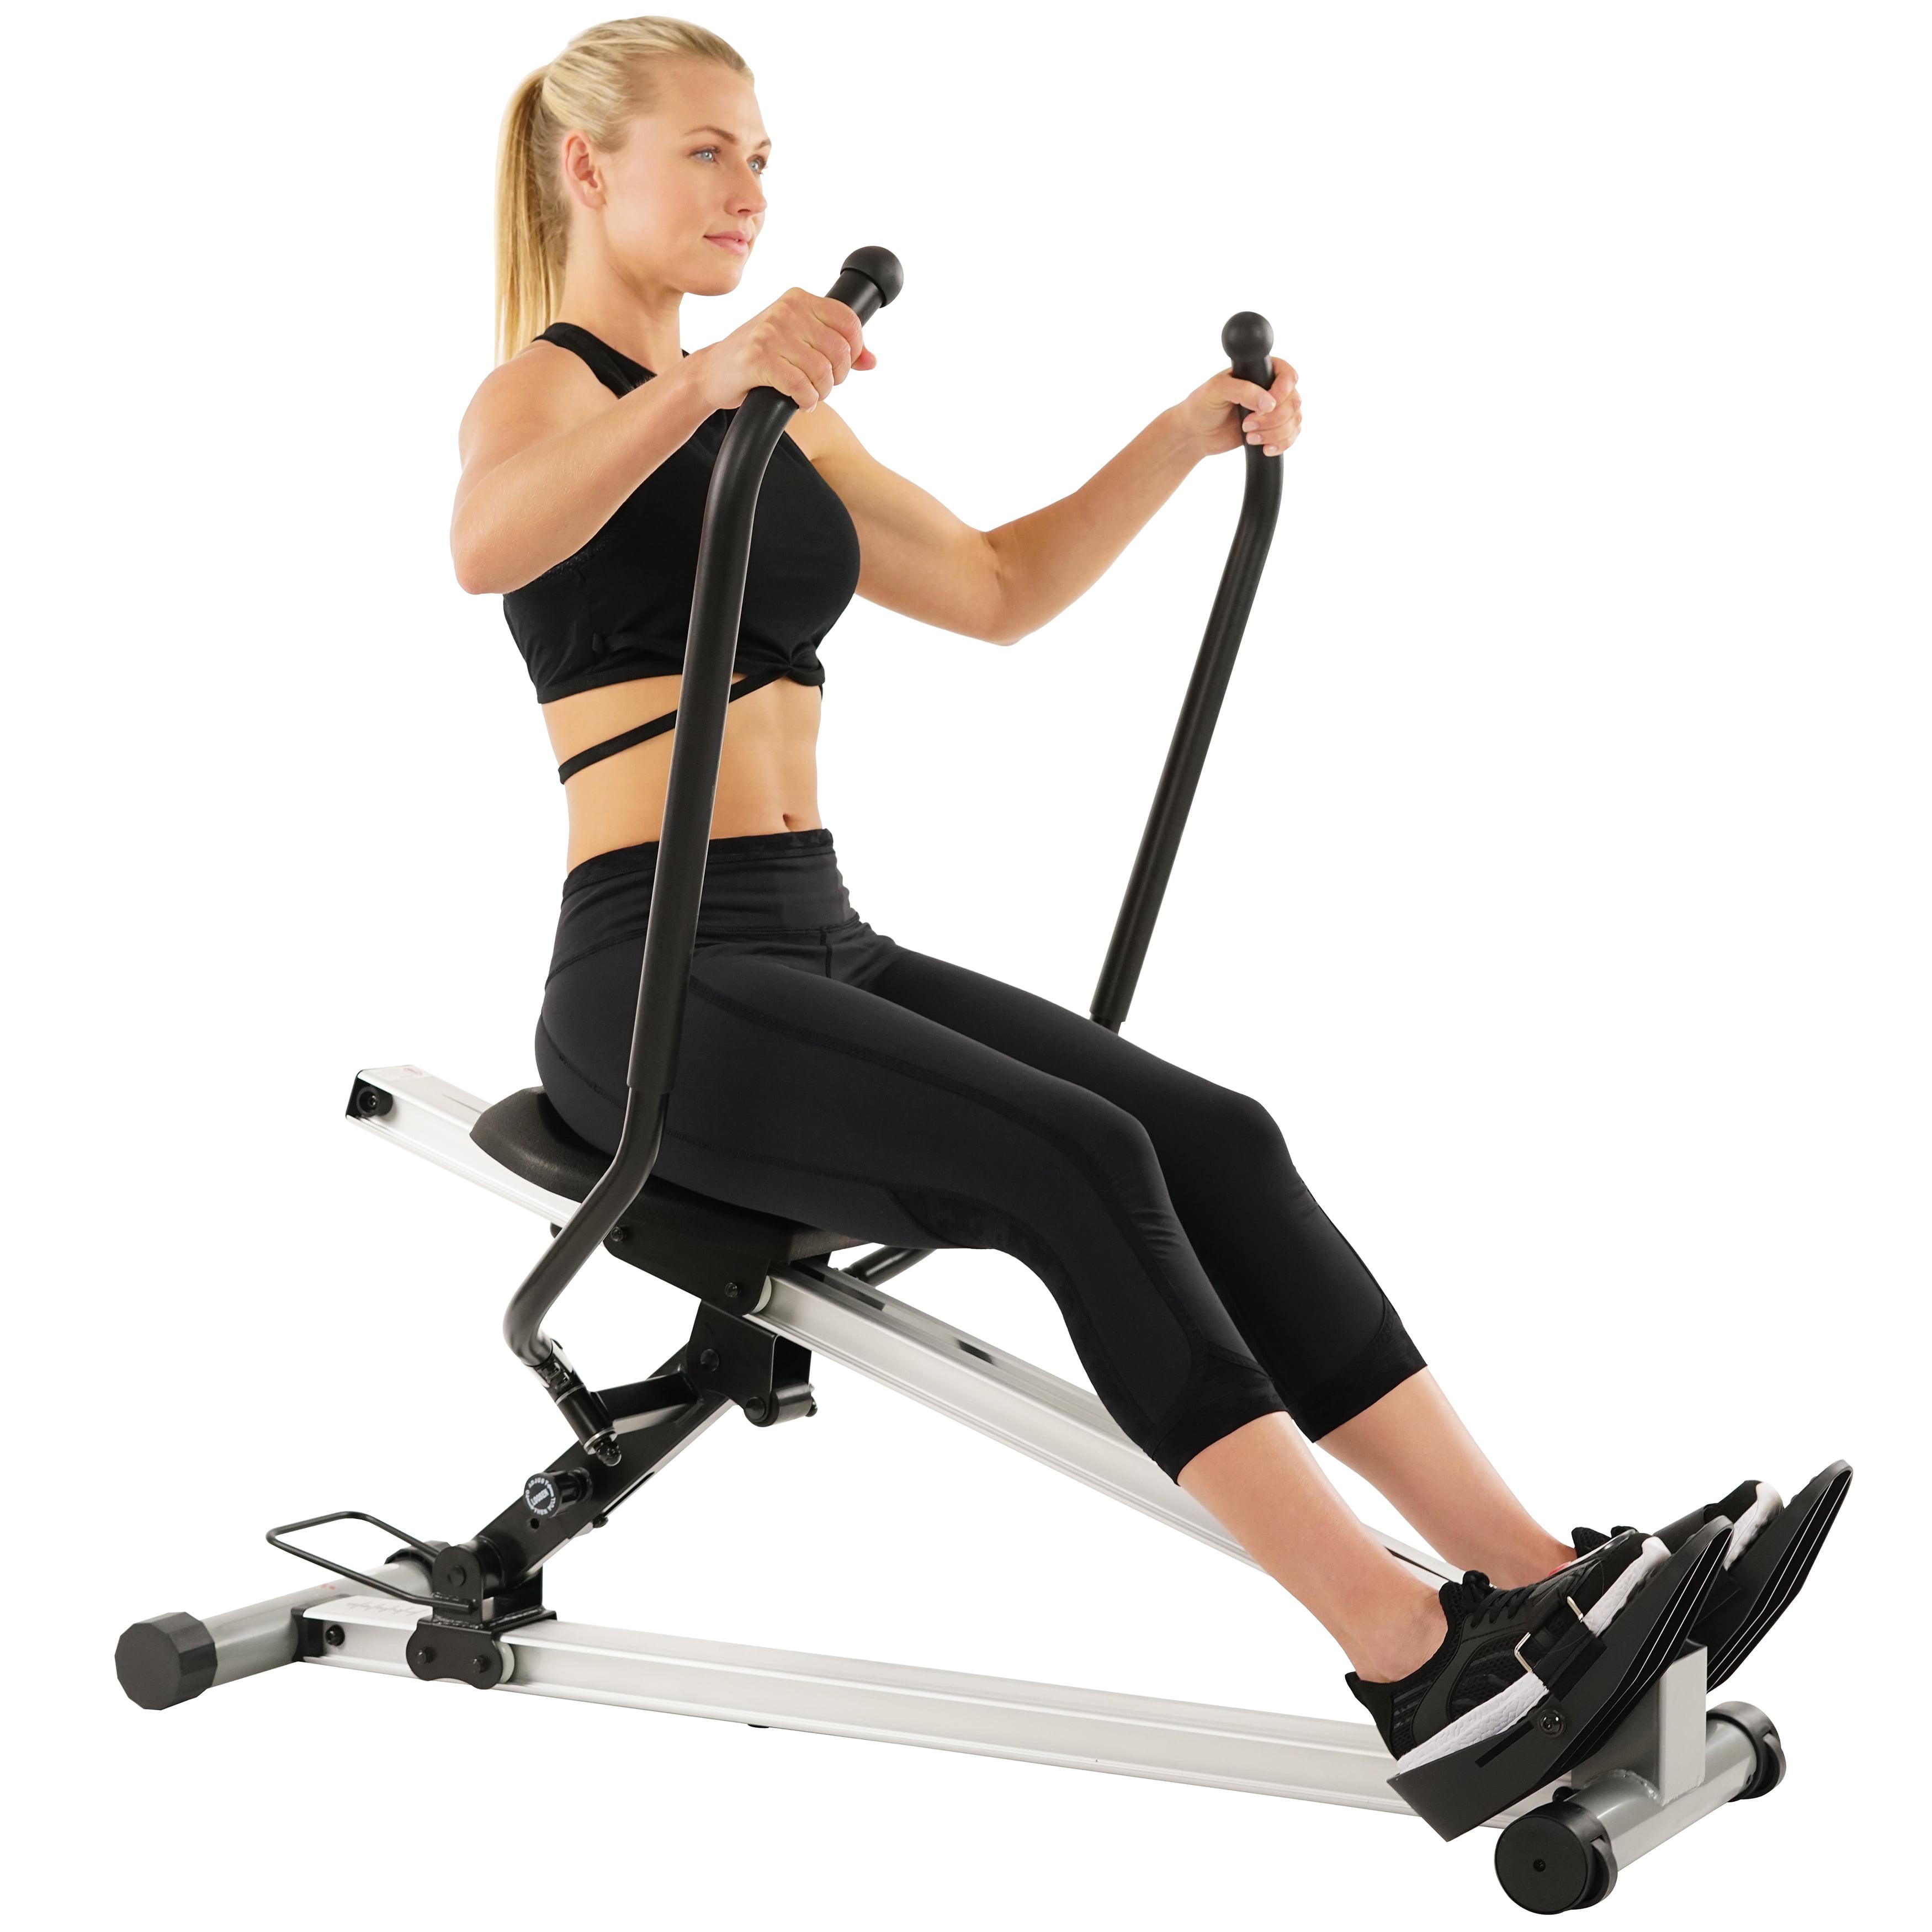 Sunny Health & Fitness SF-RW5720 Full Motion Rower, 350lb Weight Capacity